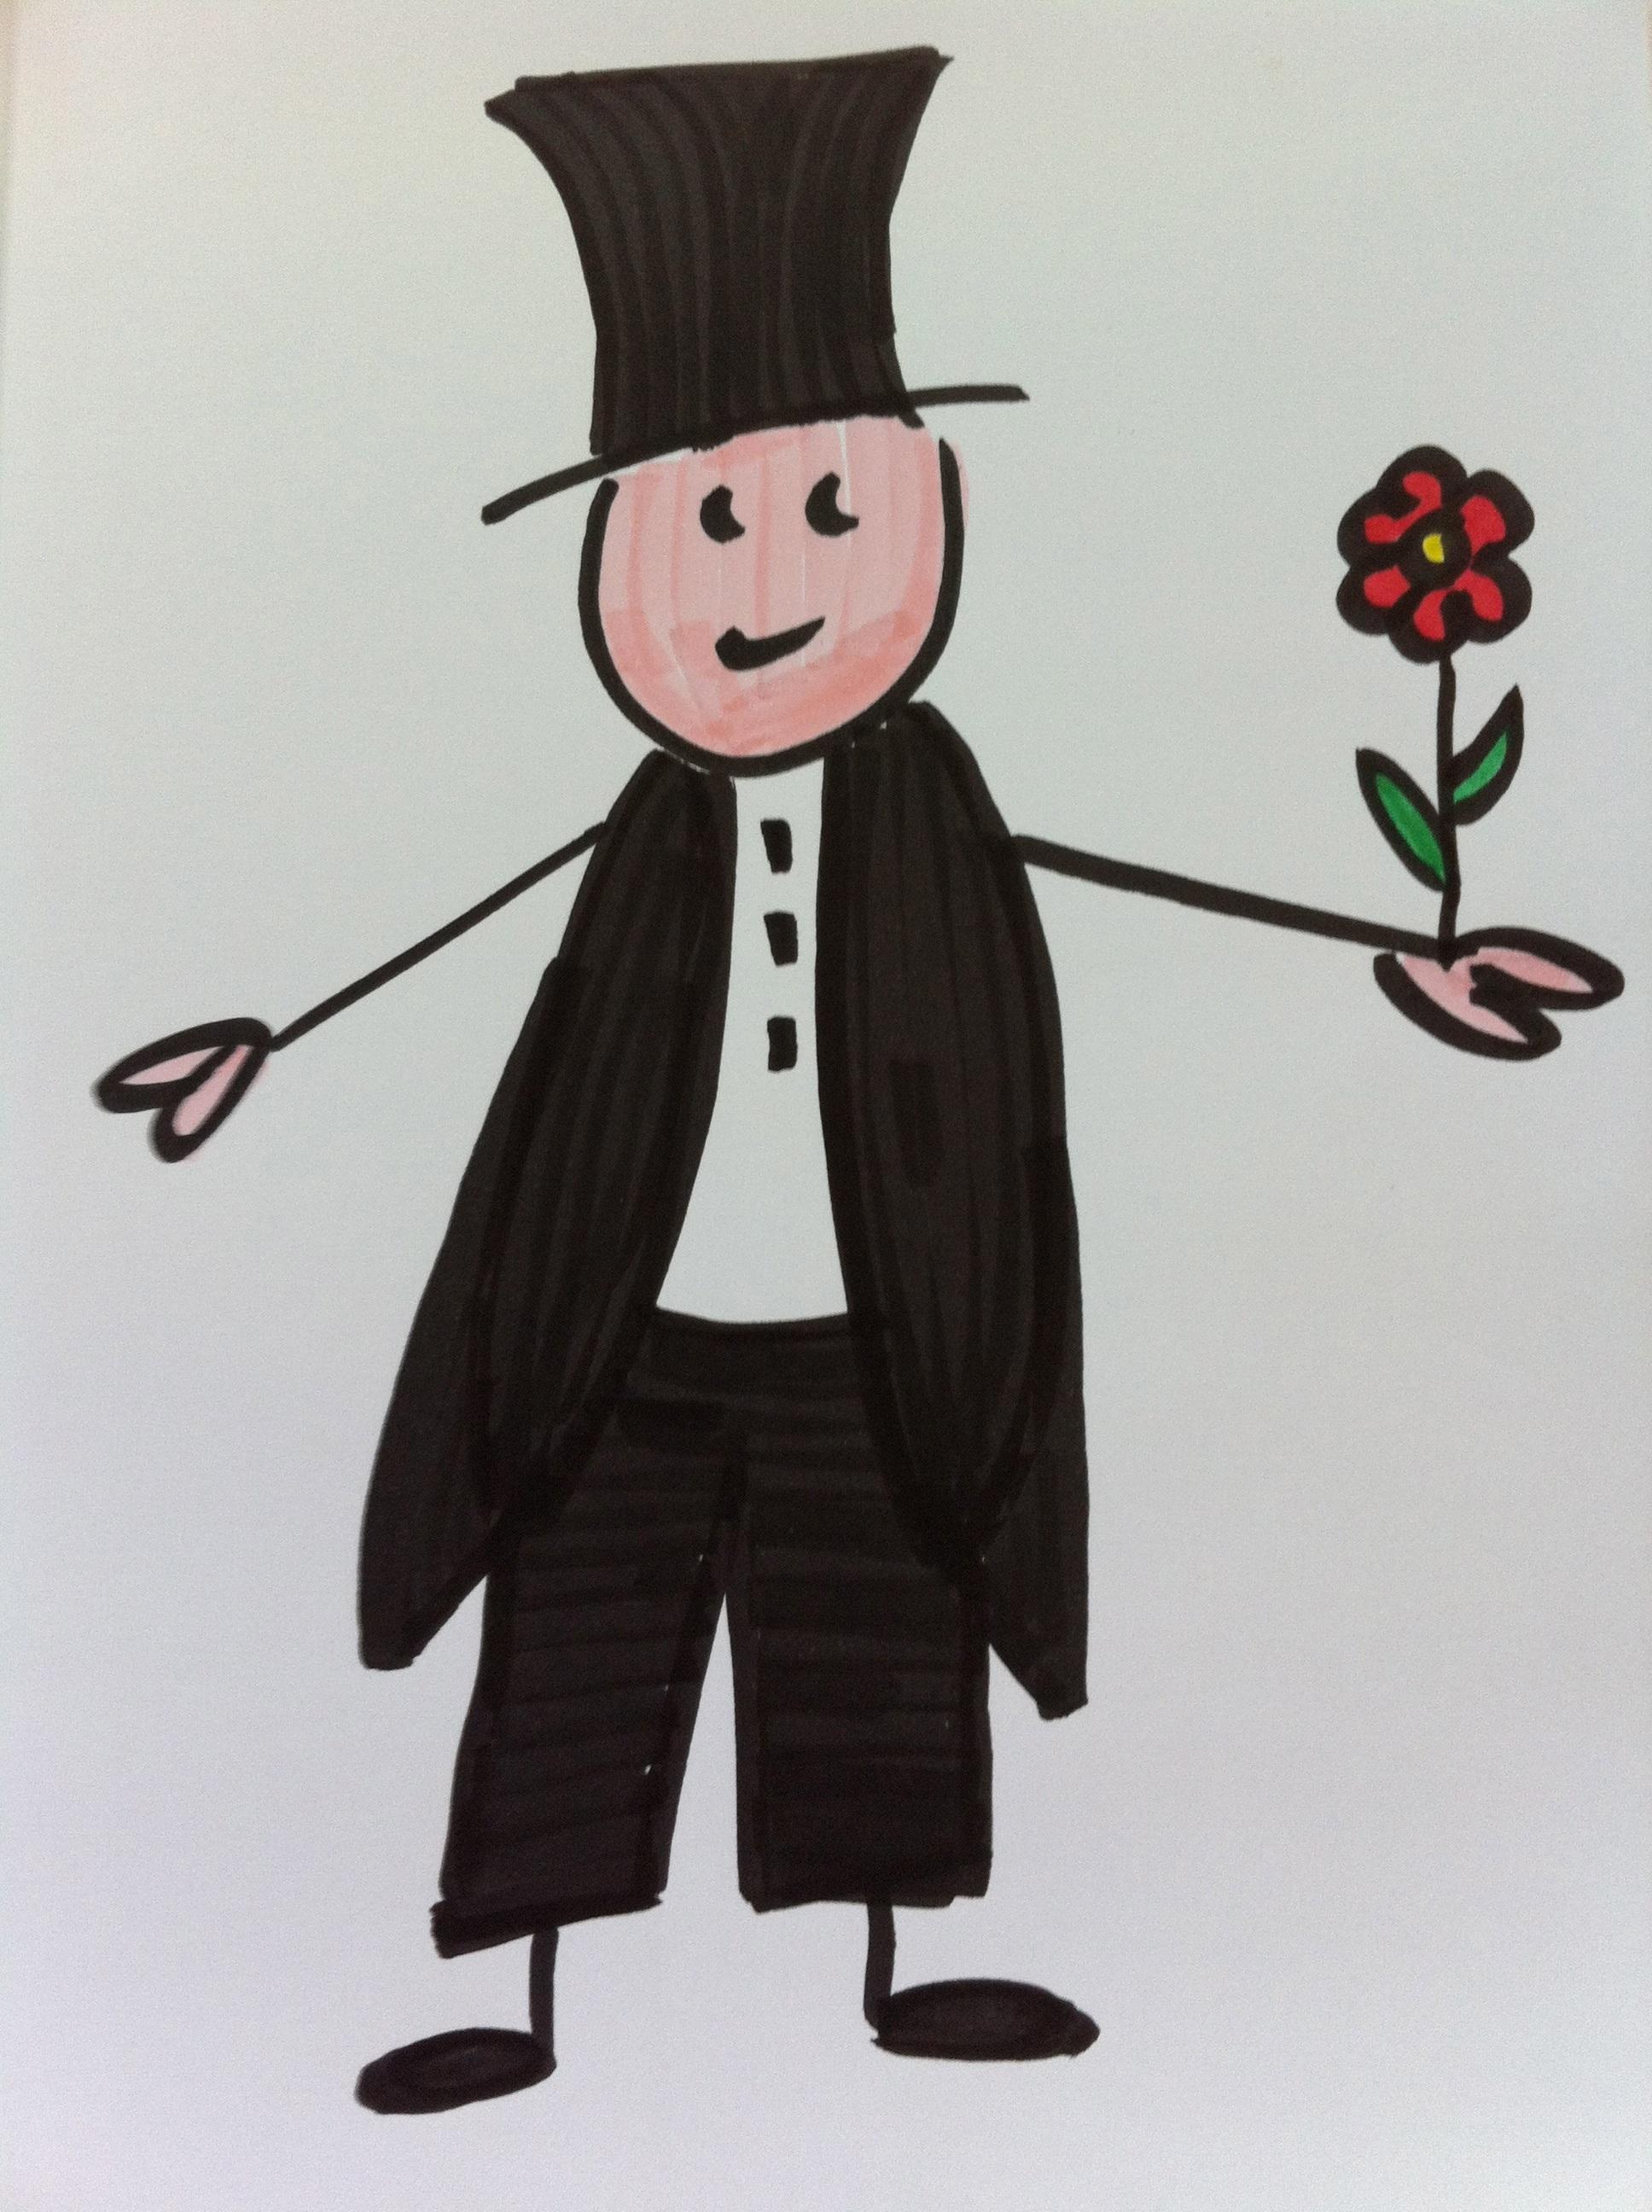 Gambar Pengantin Laki Laki Seni Sketsa Ilustrasi Orang